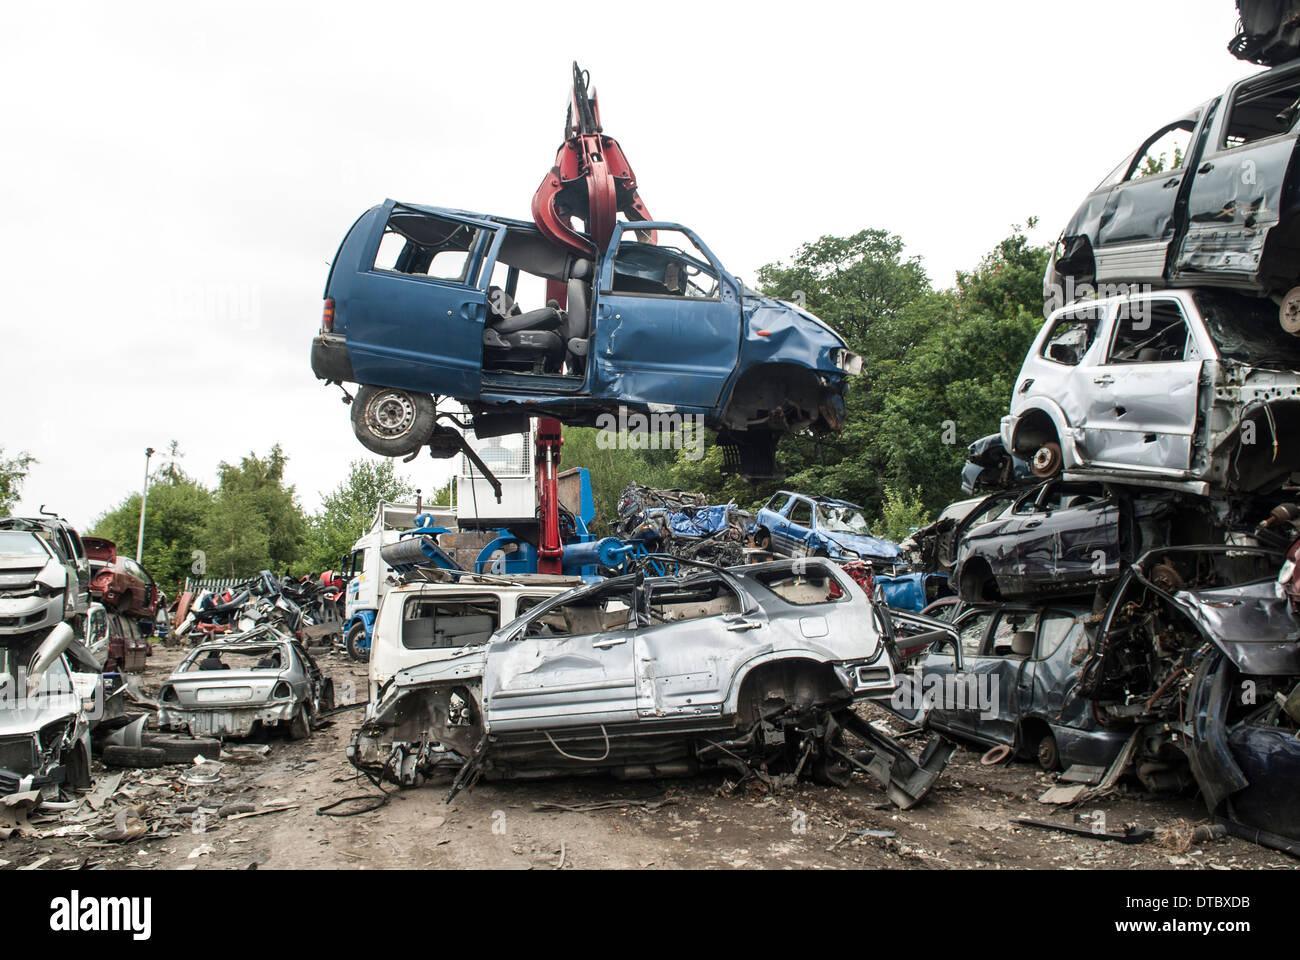 Crushed cars in scrap yard UK Stock Photo: 66645079 - Alamy